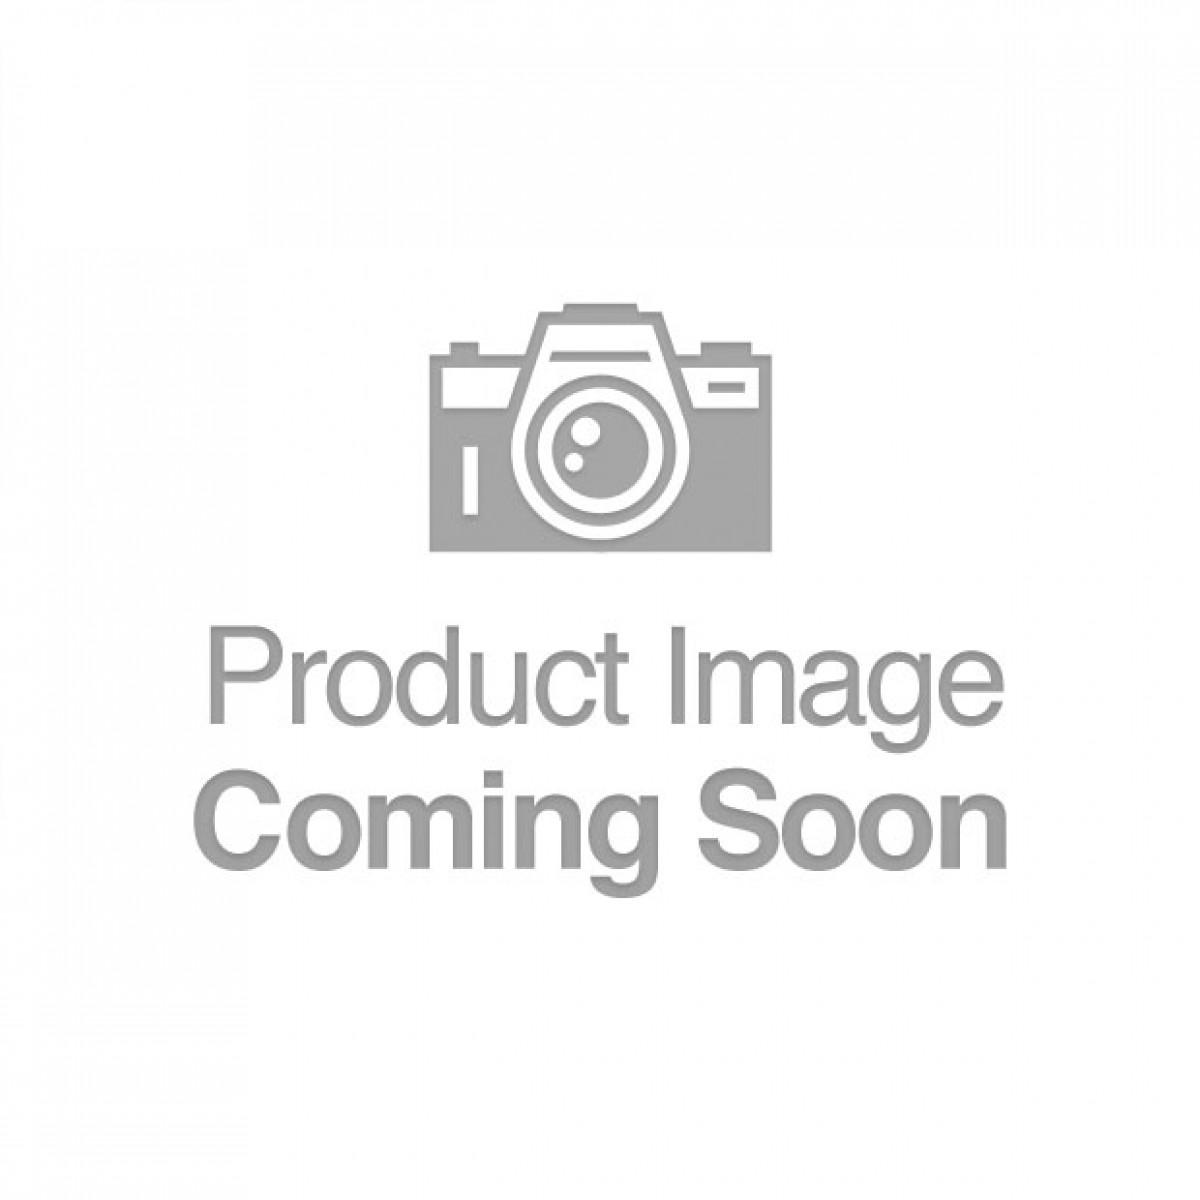 Clandestine Devices Mimic Plus - Gray